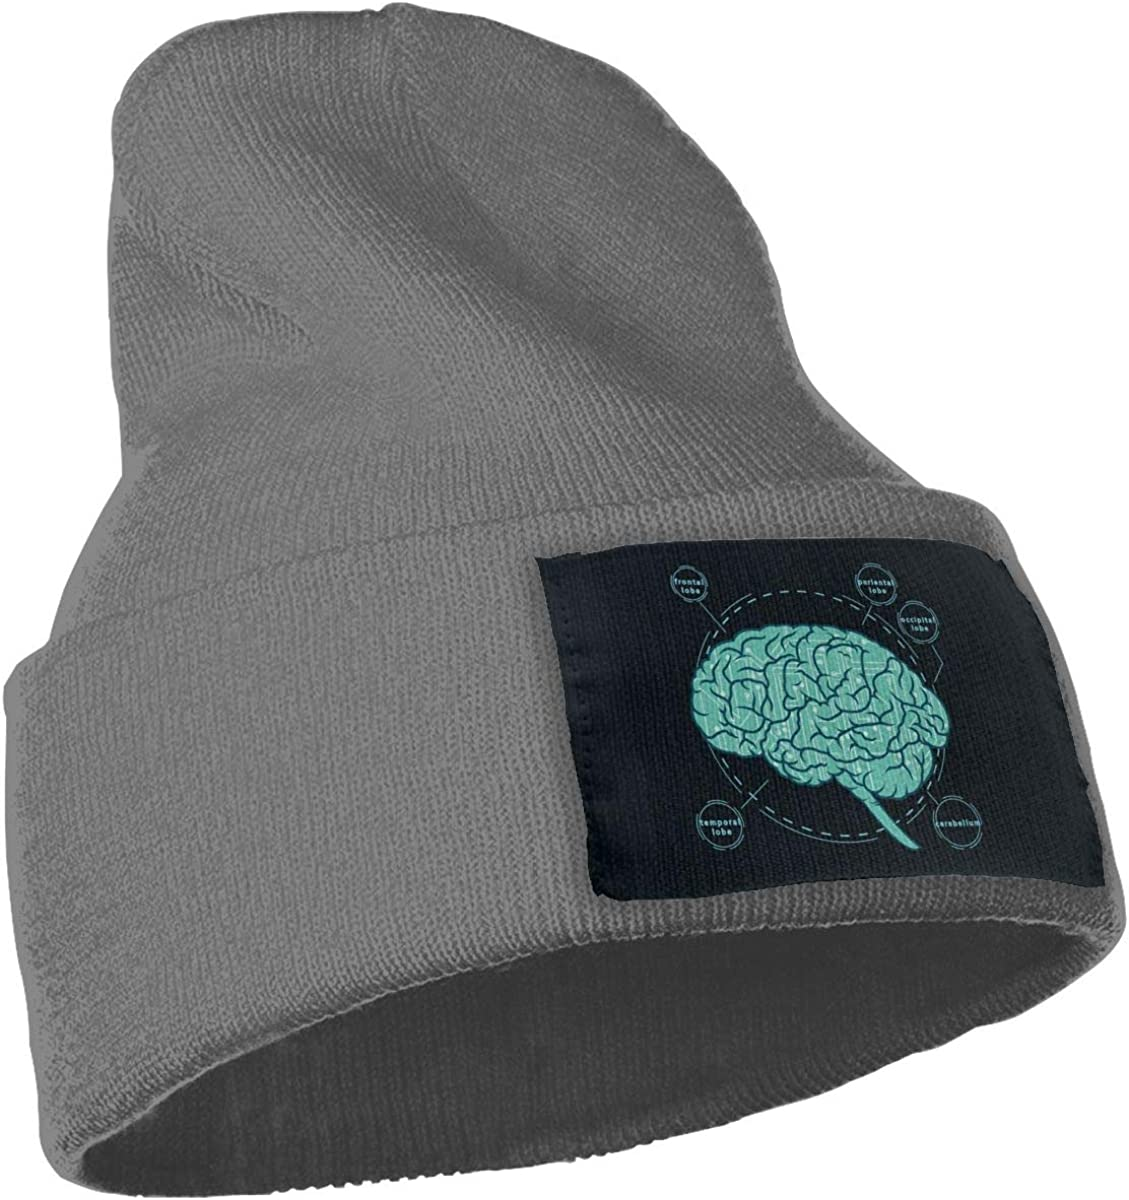 JimHappy World Brain Tumor Winter Warm Hats,Knit Slouchy Thick Skull Cap Black